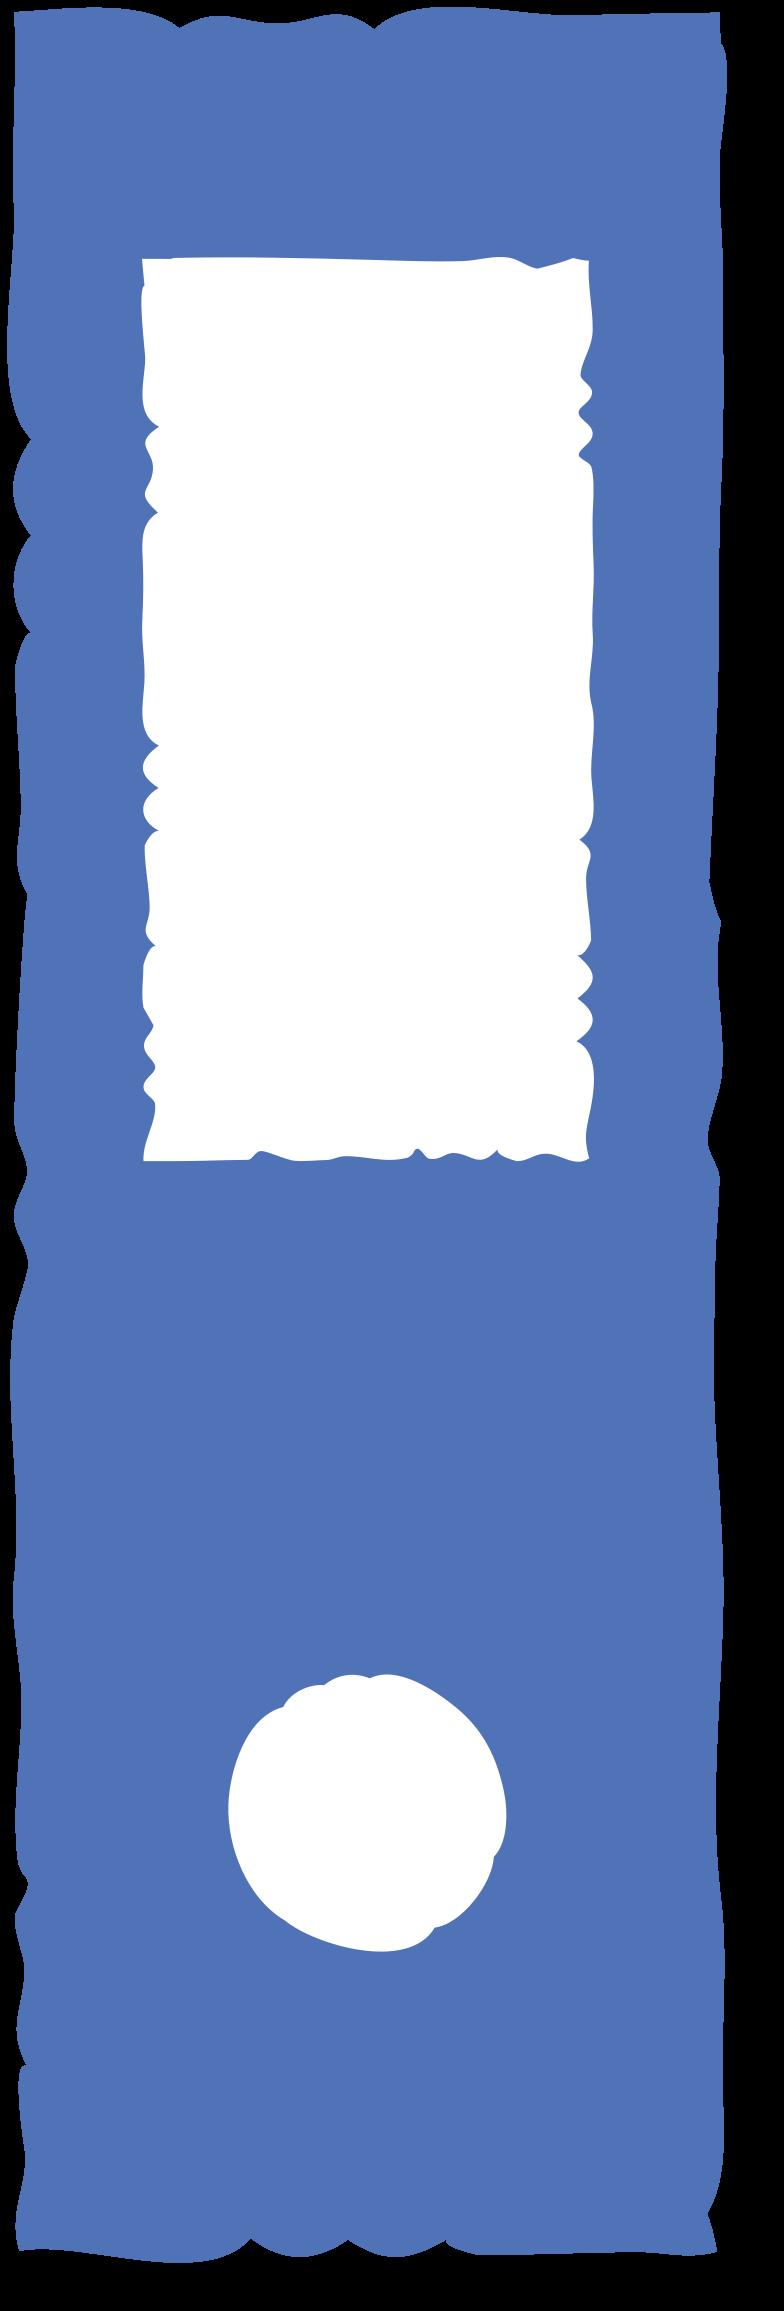 document case Clipart illustration in PNG, SVG